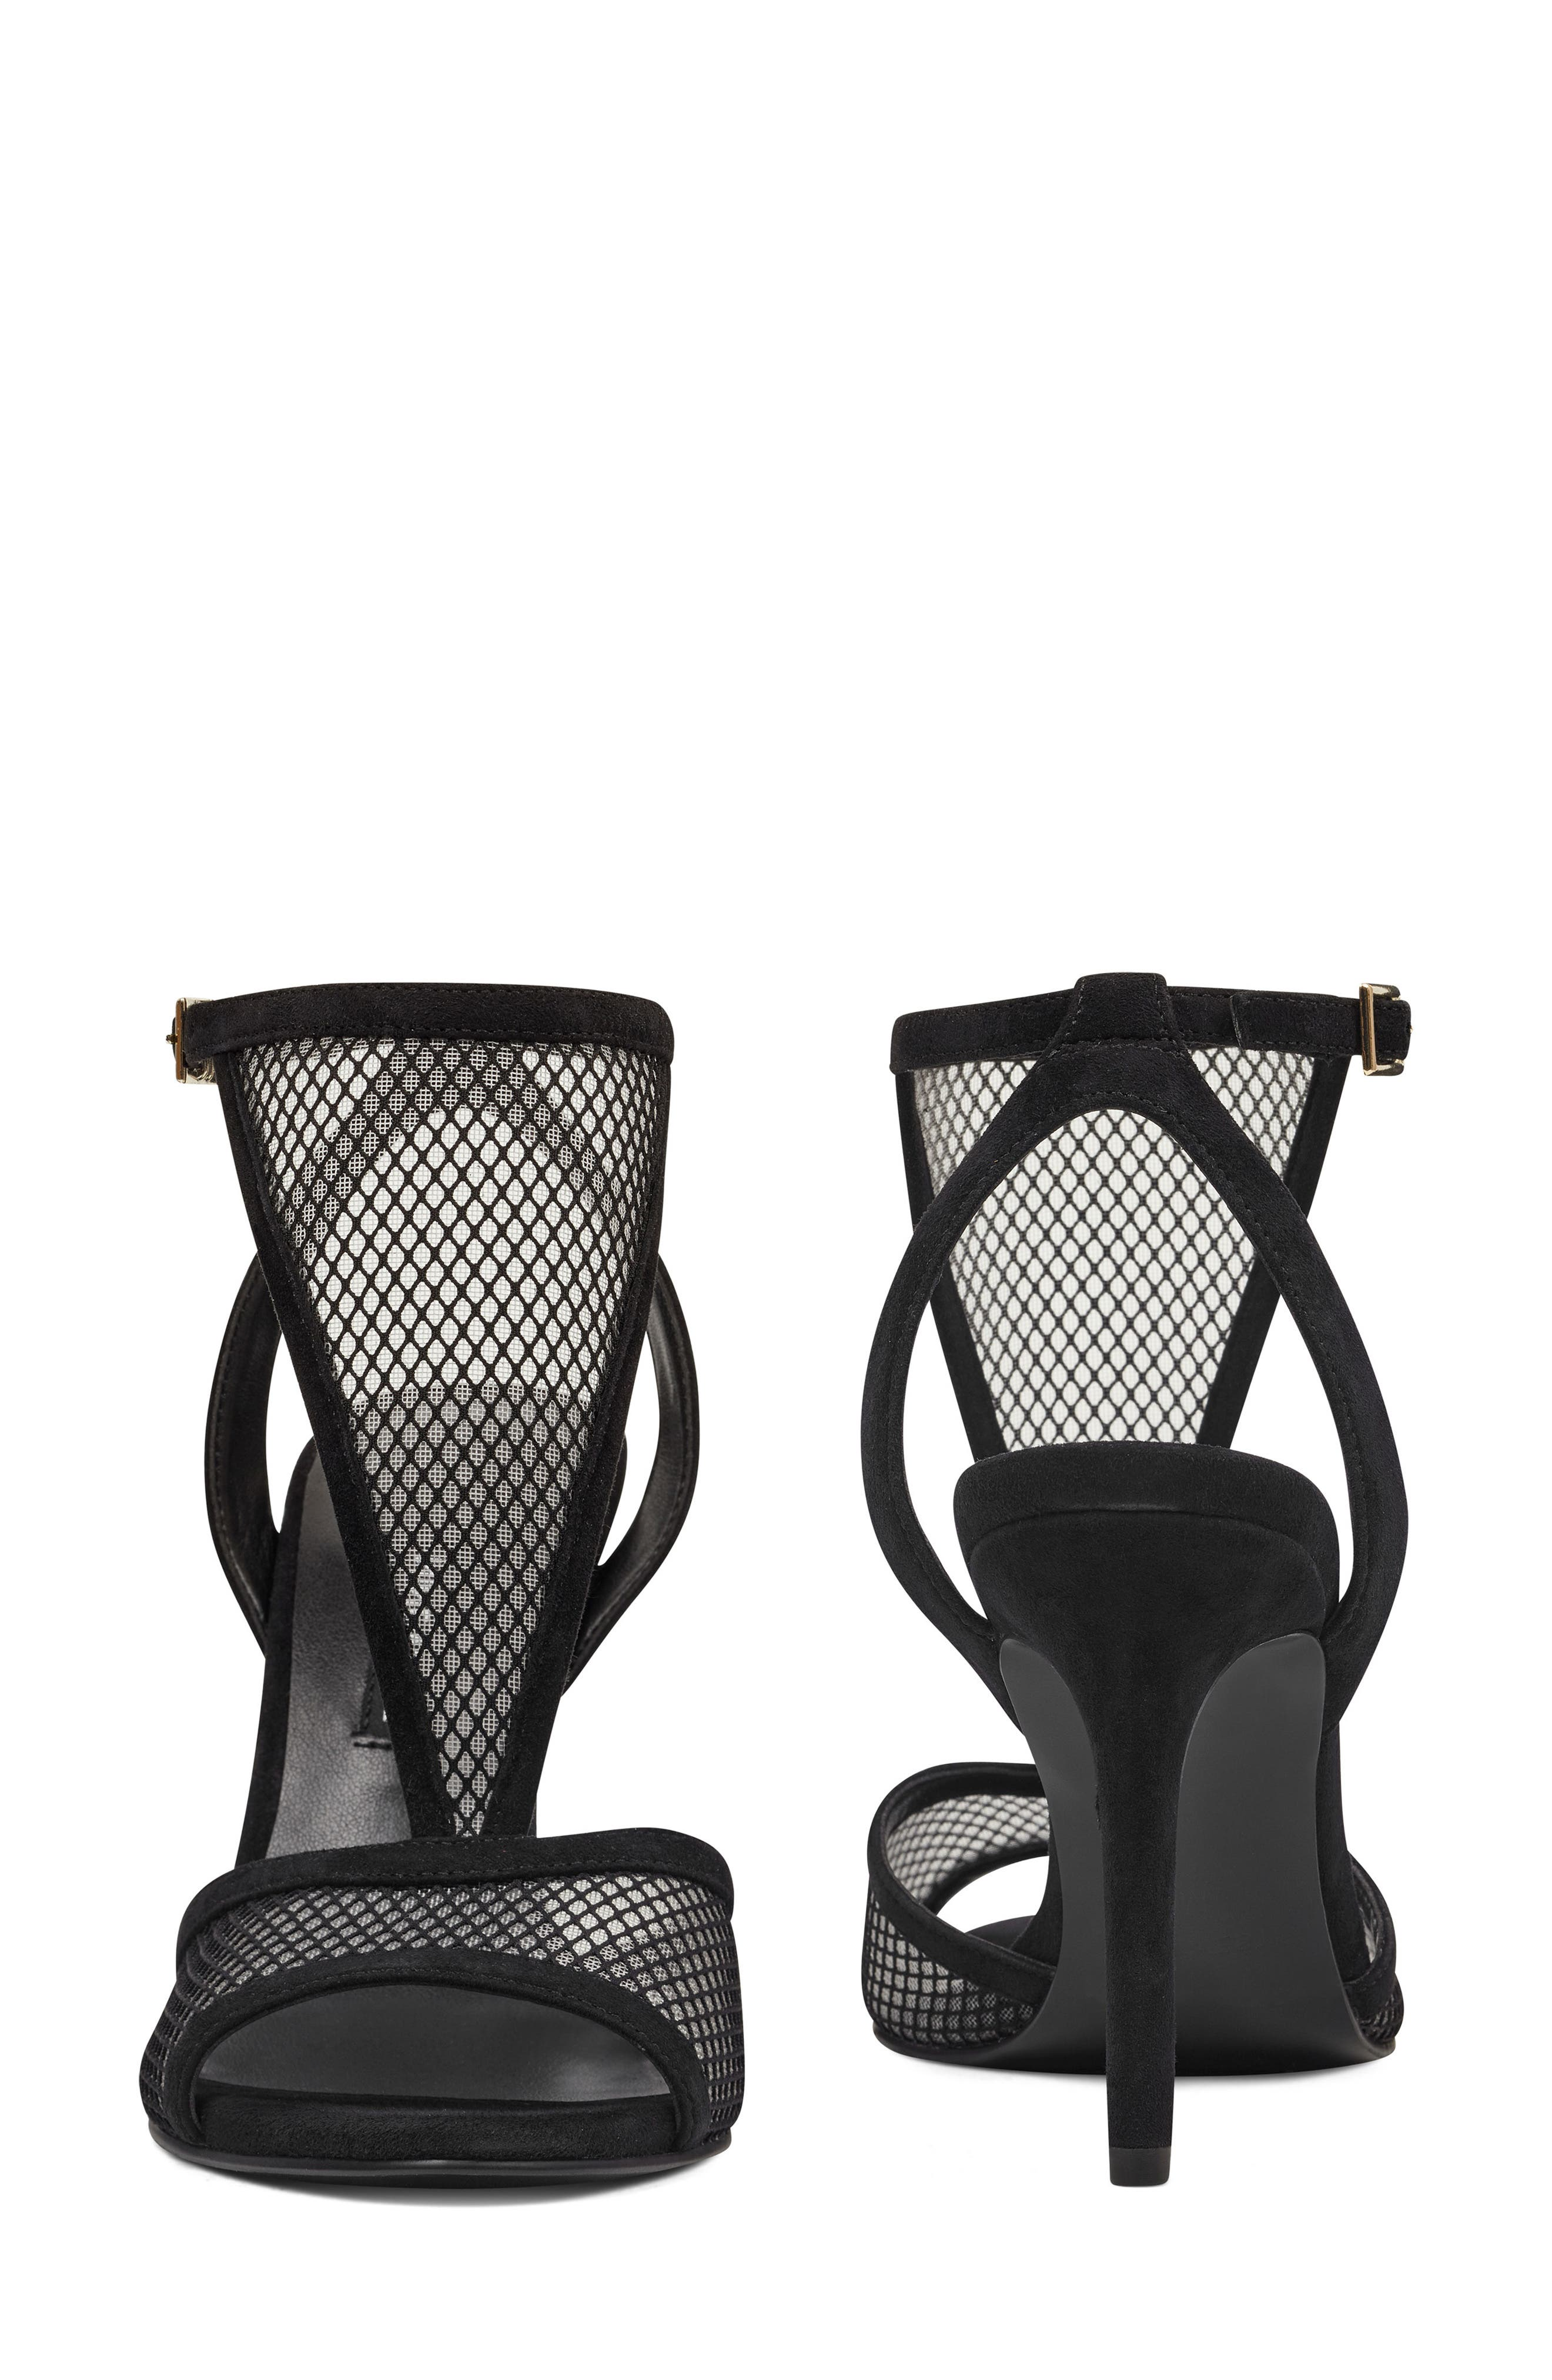 Manchon 2 Ankle Strap Sandal,                             Alternate thumbnail 8, color,                             BLACK STRETCH MESH/ LEATHER